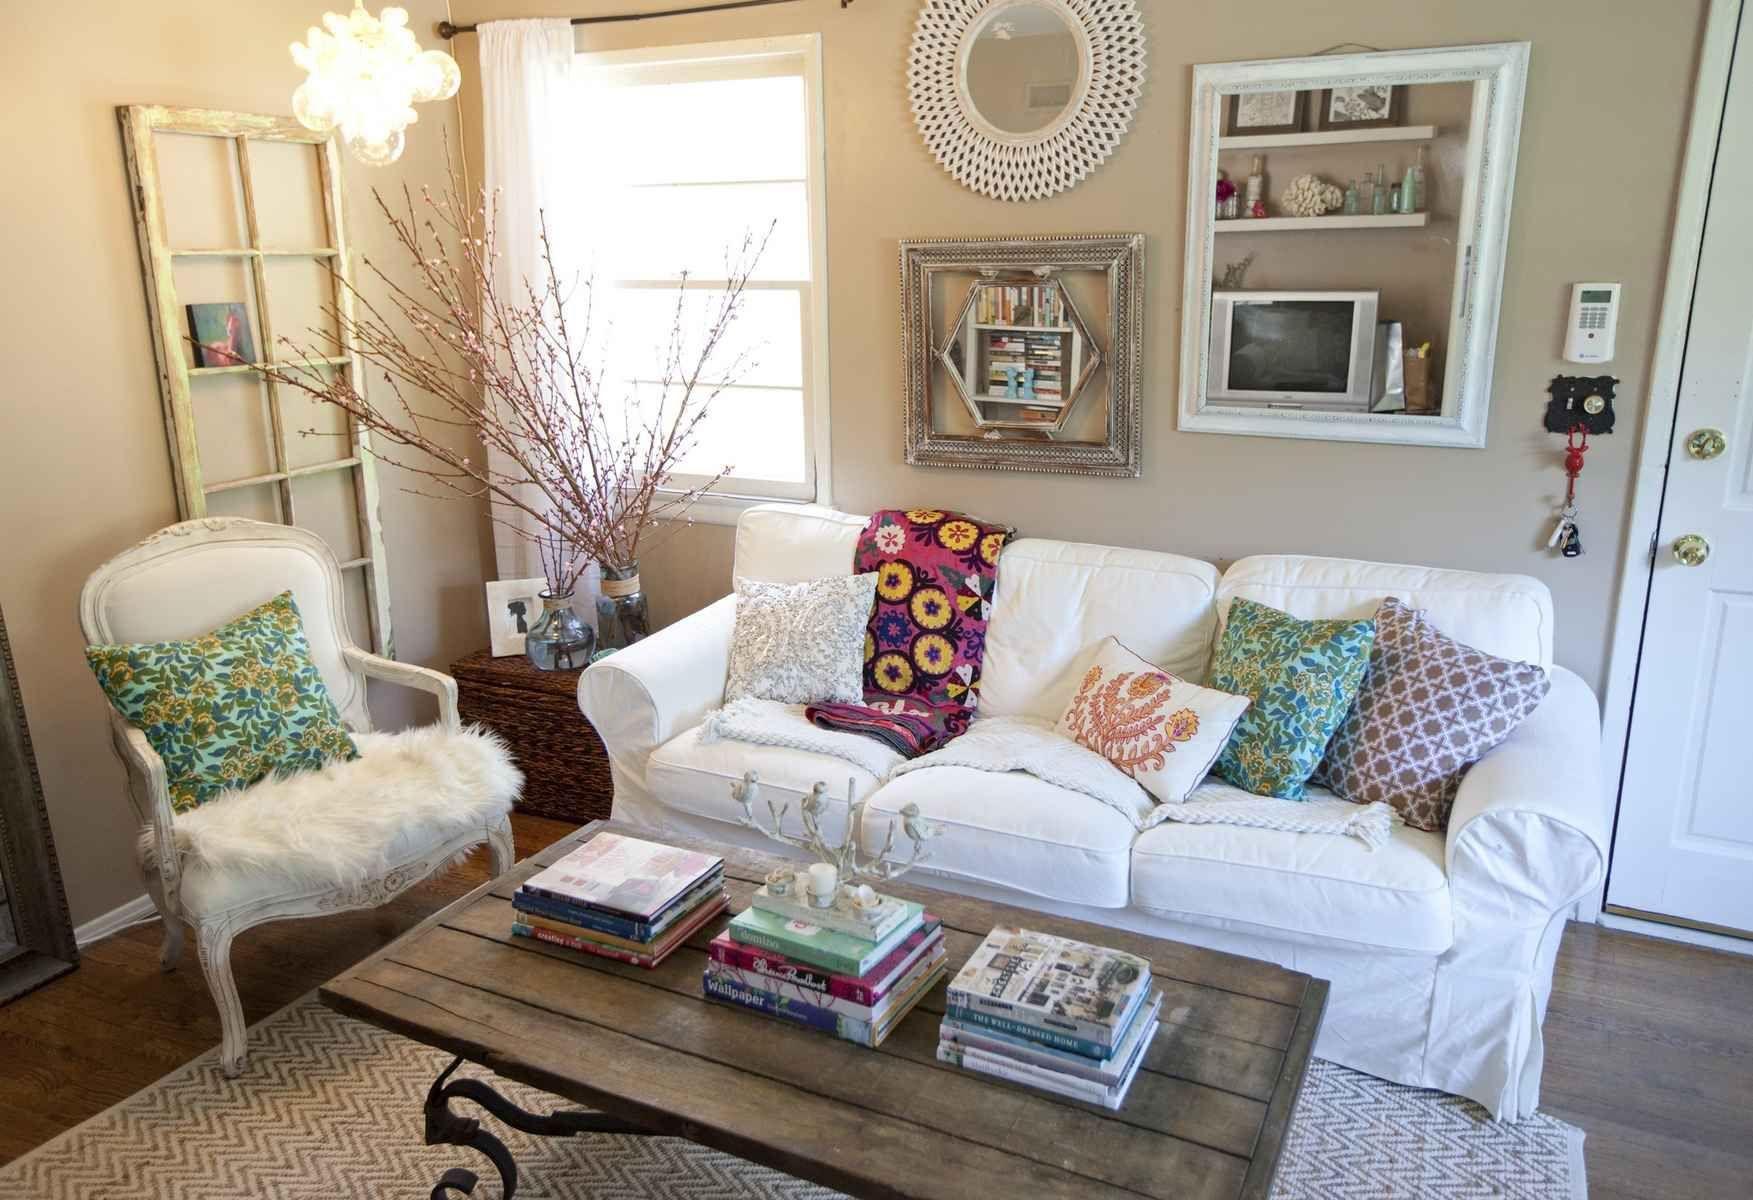 furniture chic livings shabby room ideas living design of new farmhouse